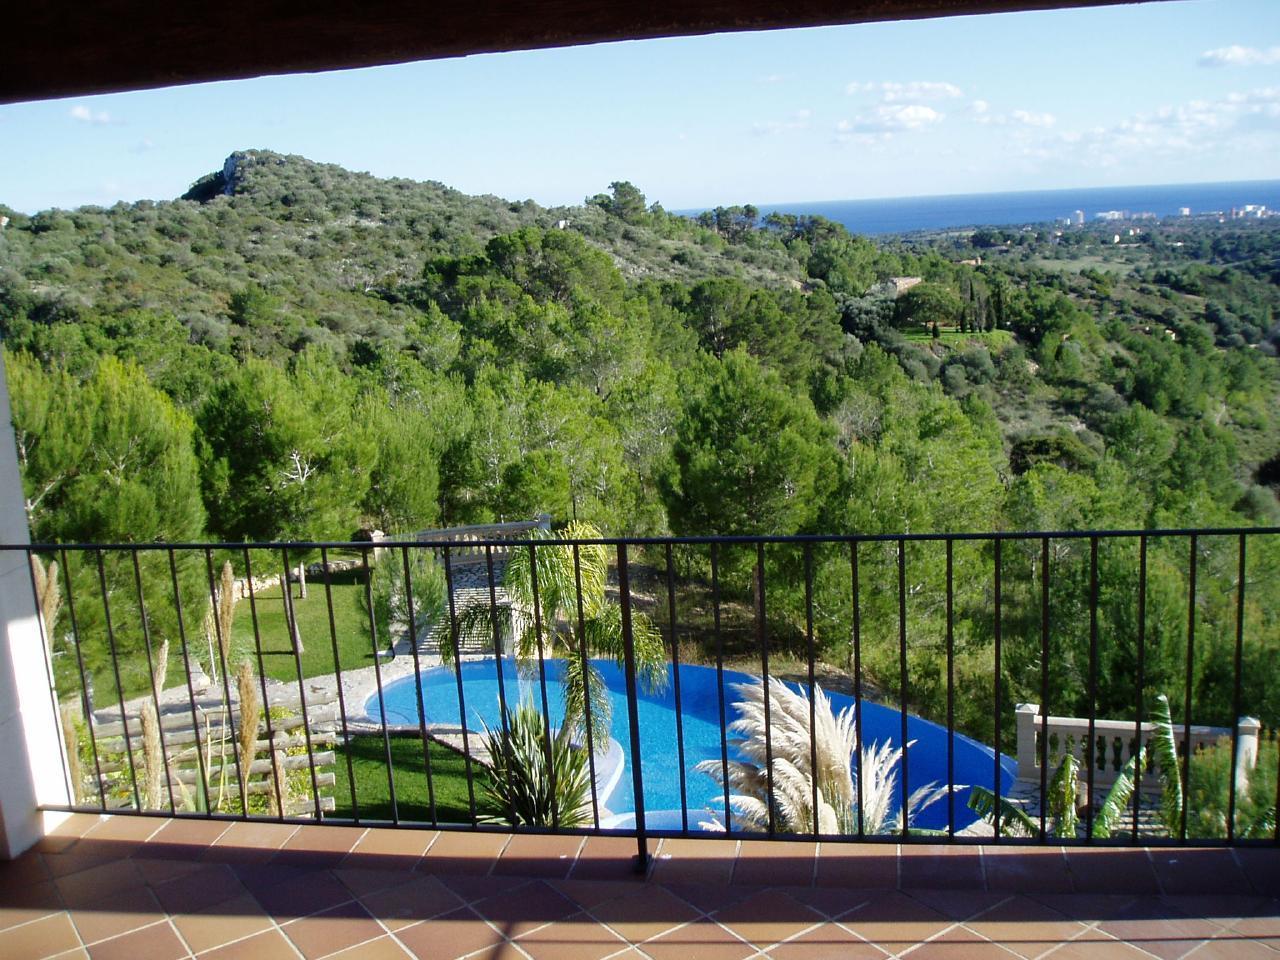 Ferienhaus Es Puig de Sa Mola (319440), Son Macià, Mallorca, Balearische Inseln, Spanien, Bild 6